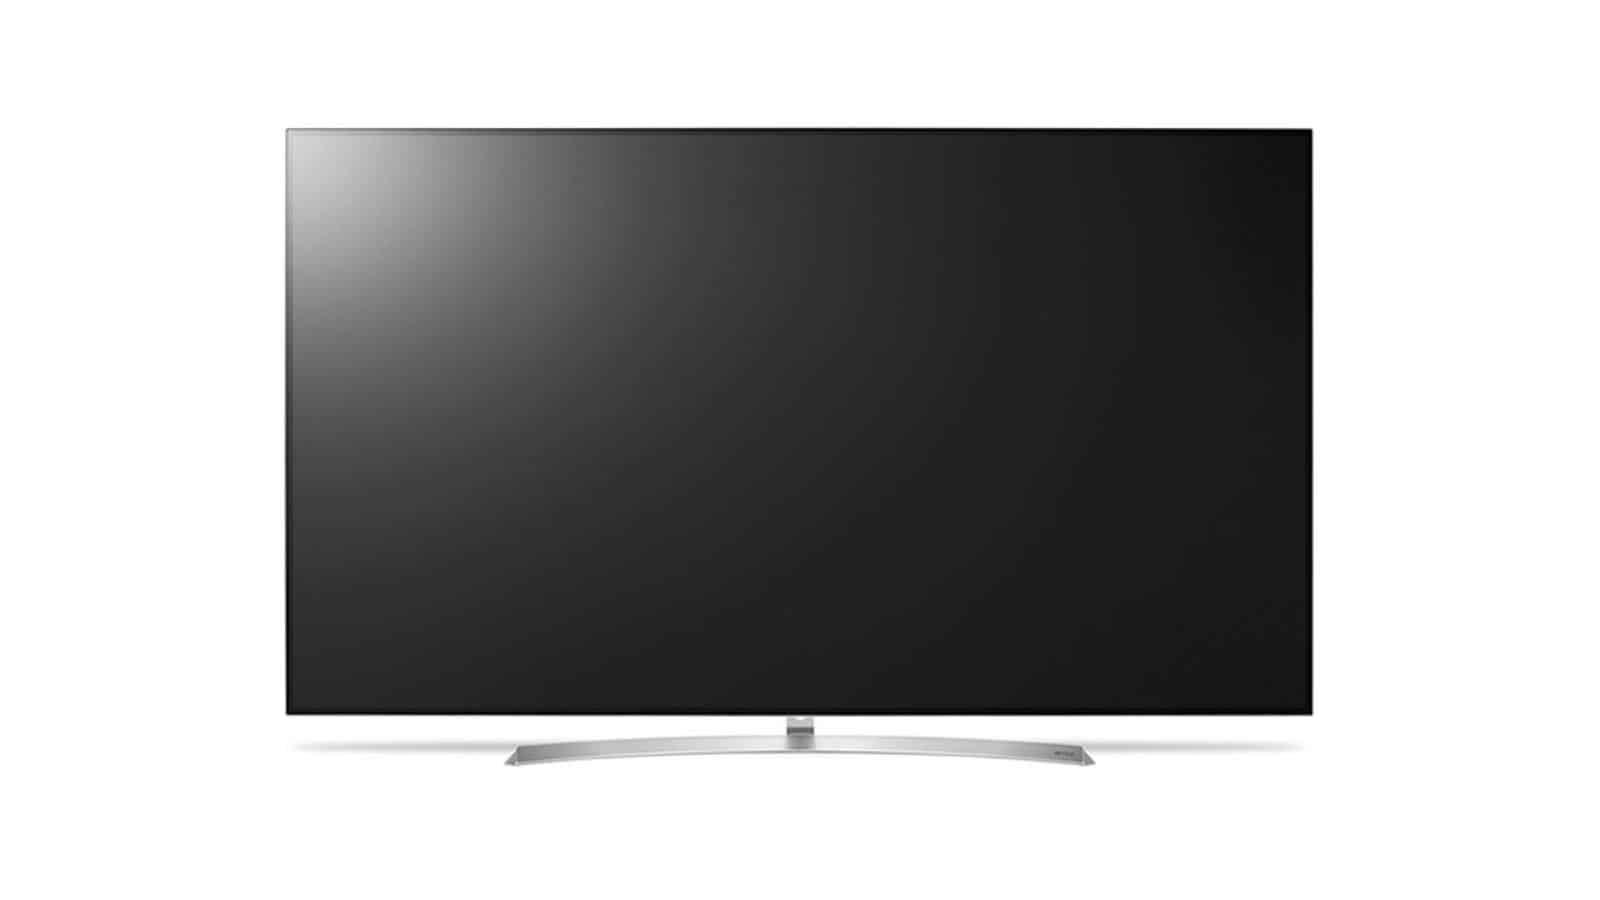 4KTV 不能顯示 HDR 急救法(上)【真 AV 教室】